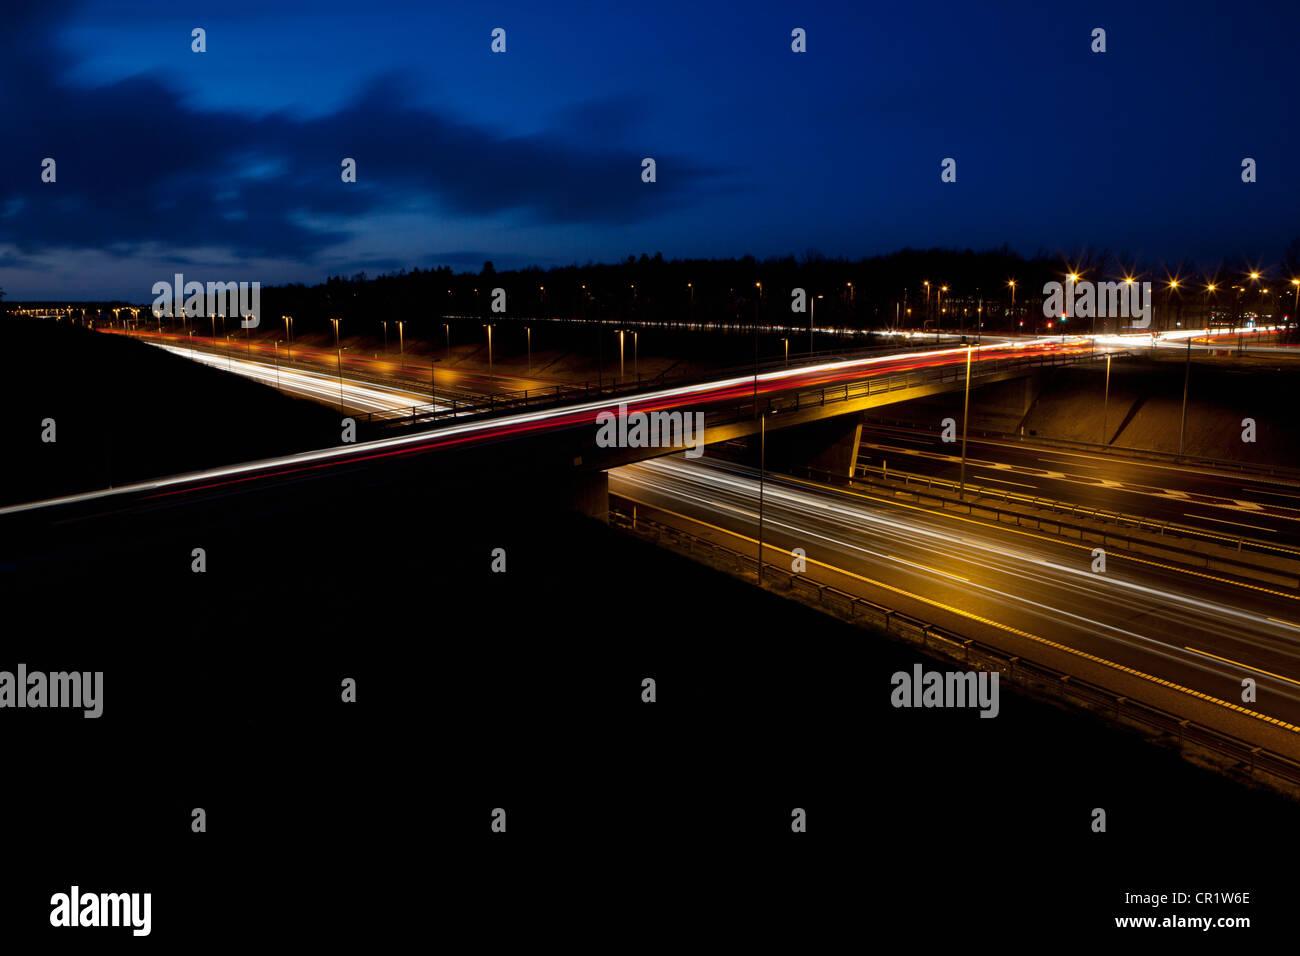 Time lapse view del tráfico por la noche Imagen De Stock